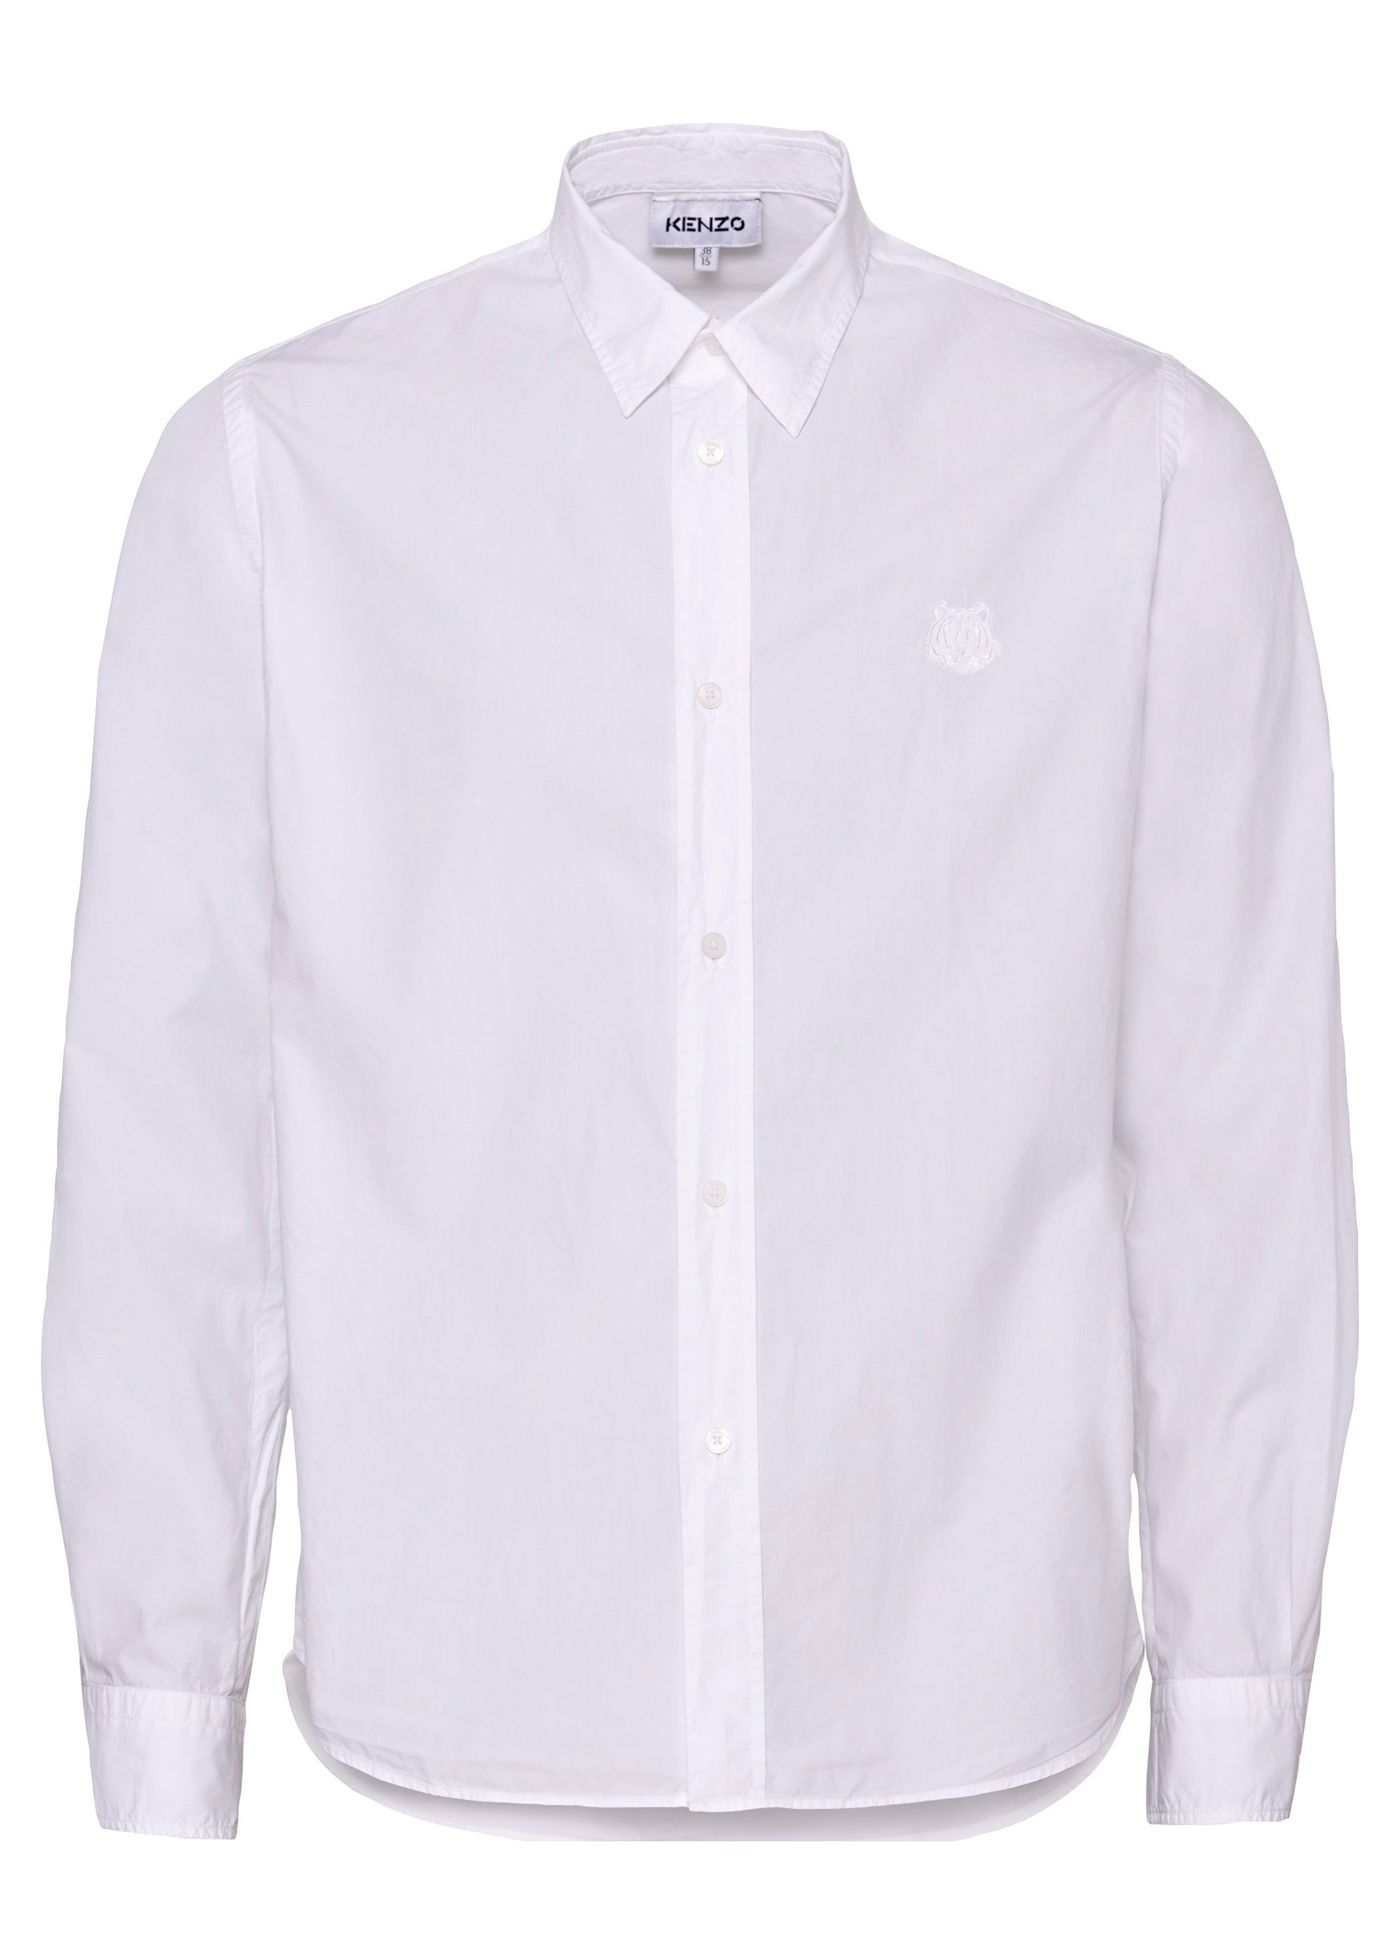 Shirt image number 0